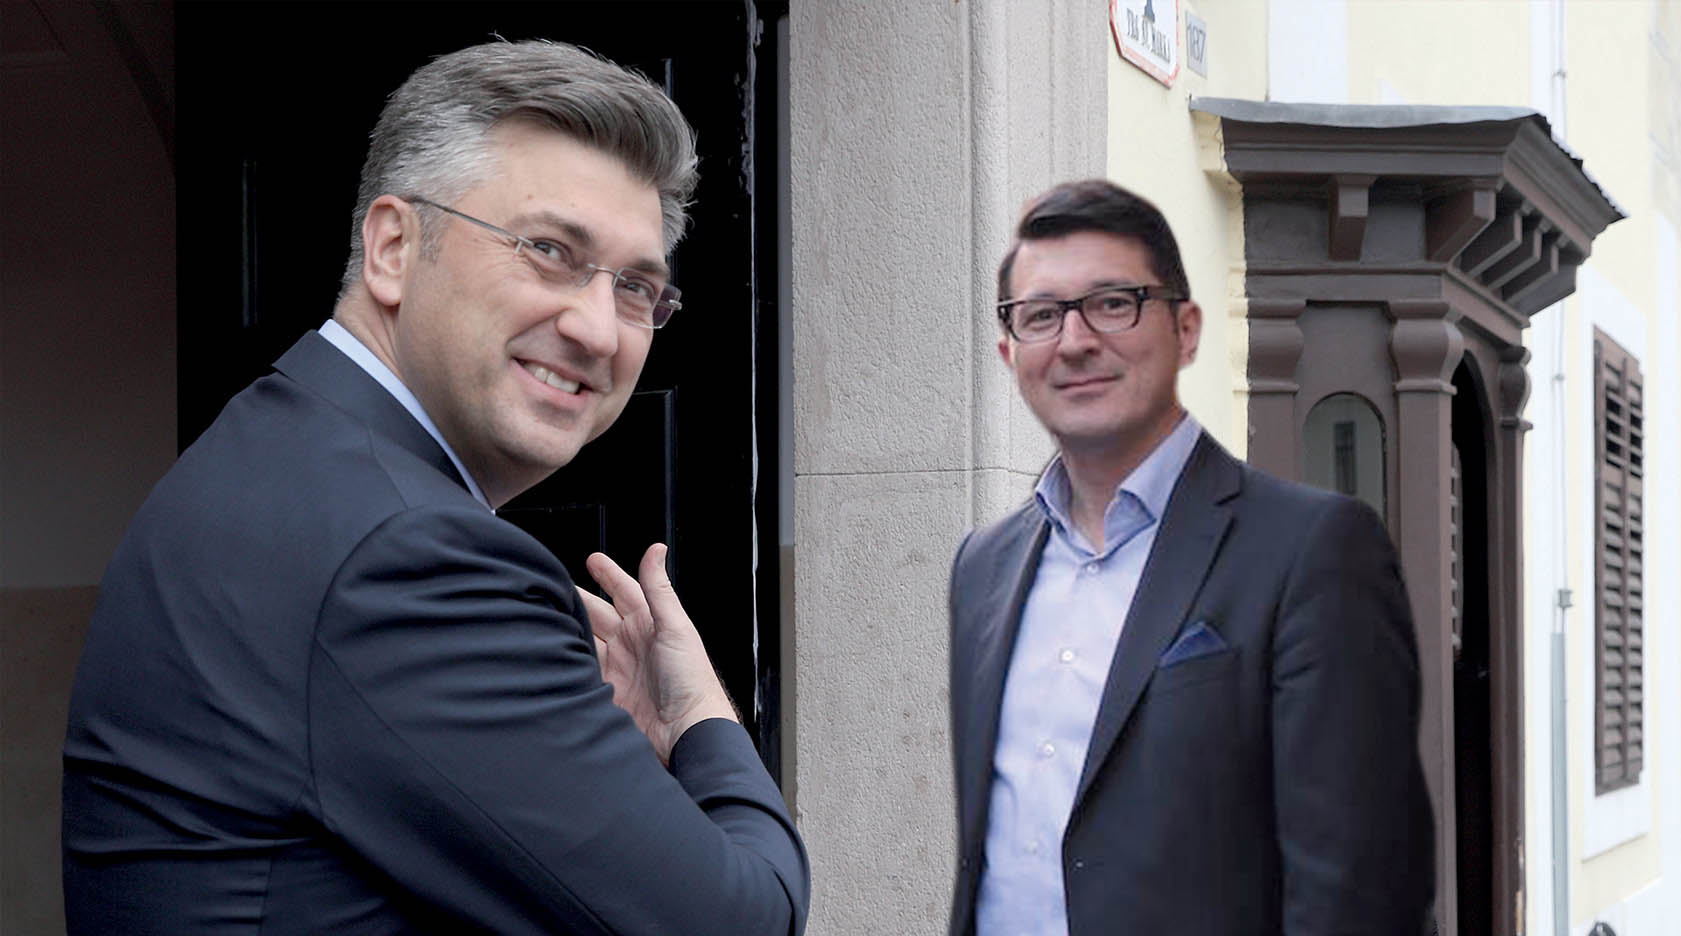 EKSKLUZIVNO Plenković doveo Šavorića u Banske dvore